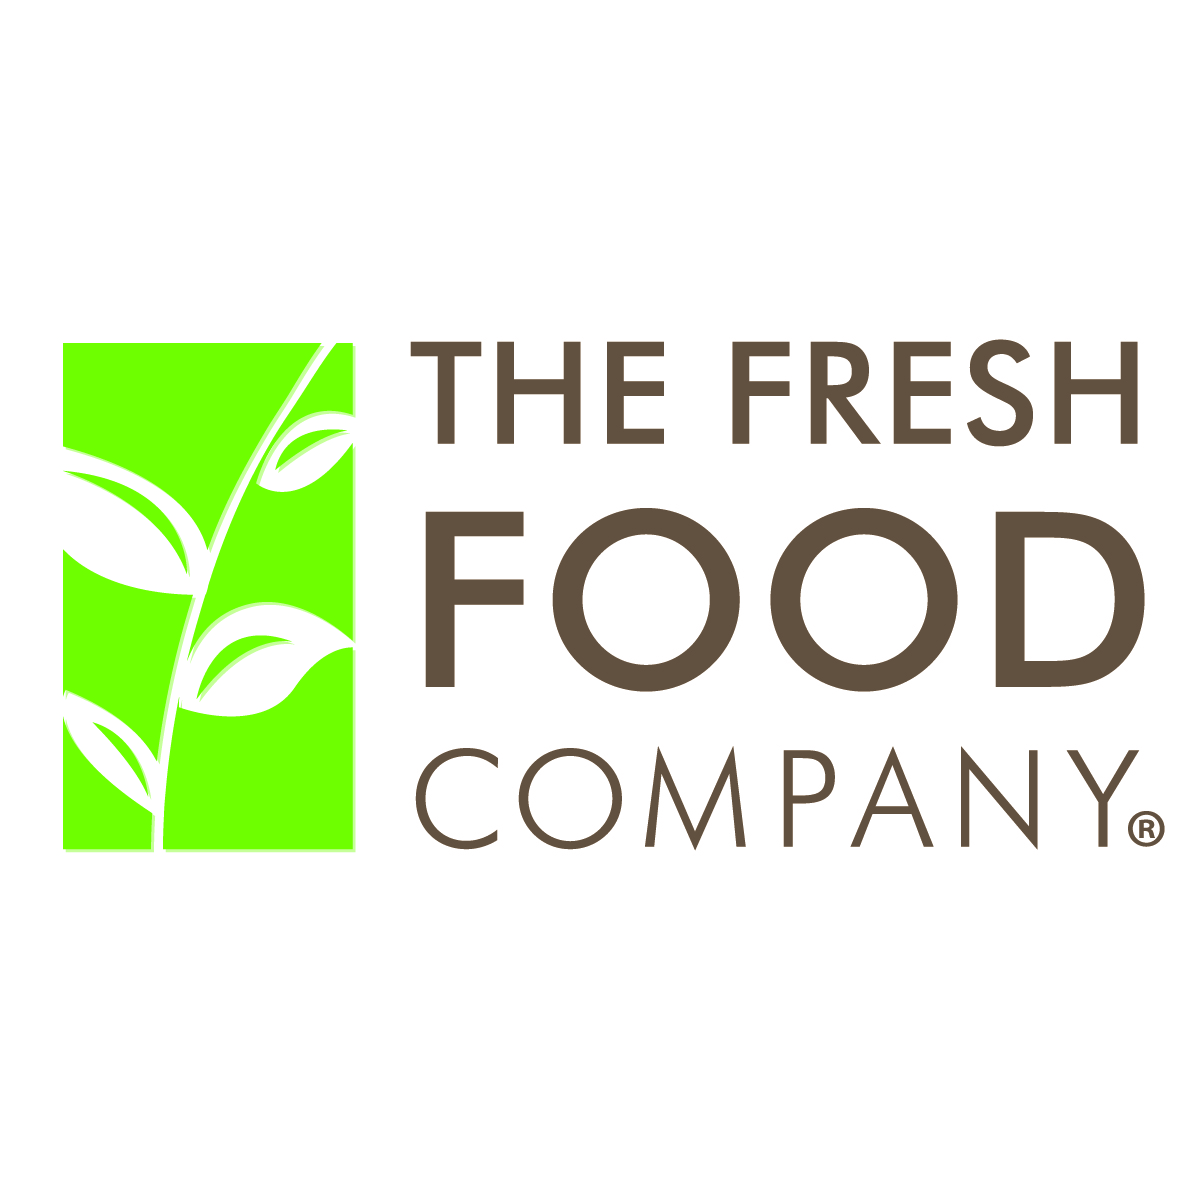 Eastway Fresh Food Company